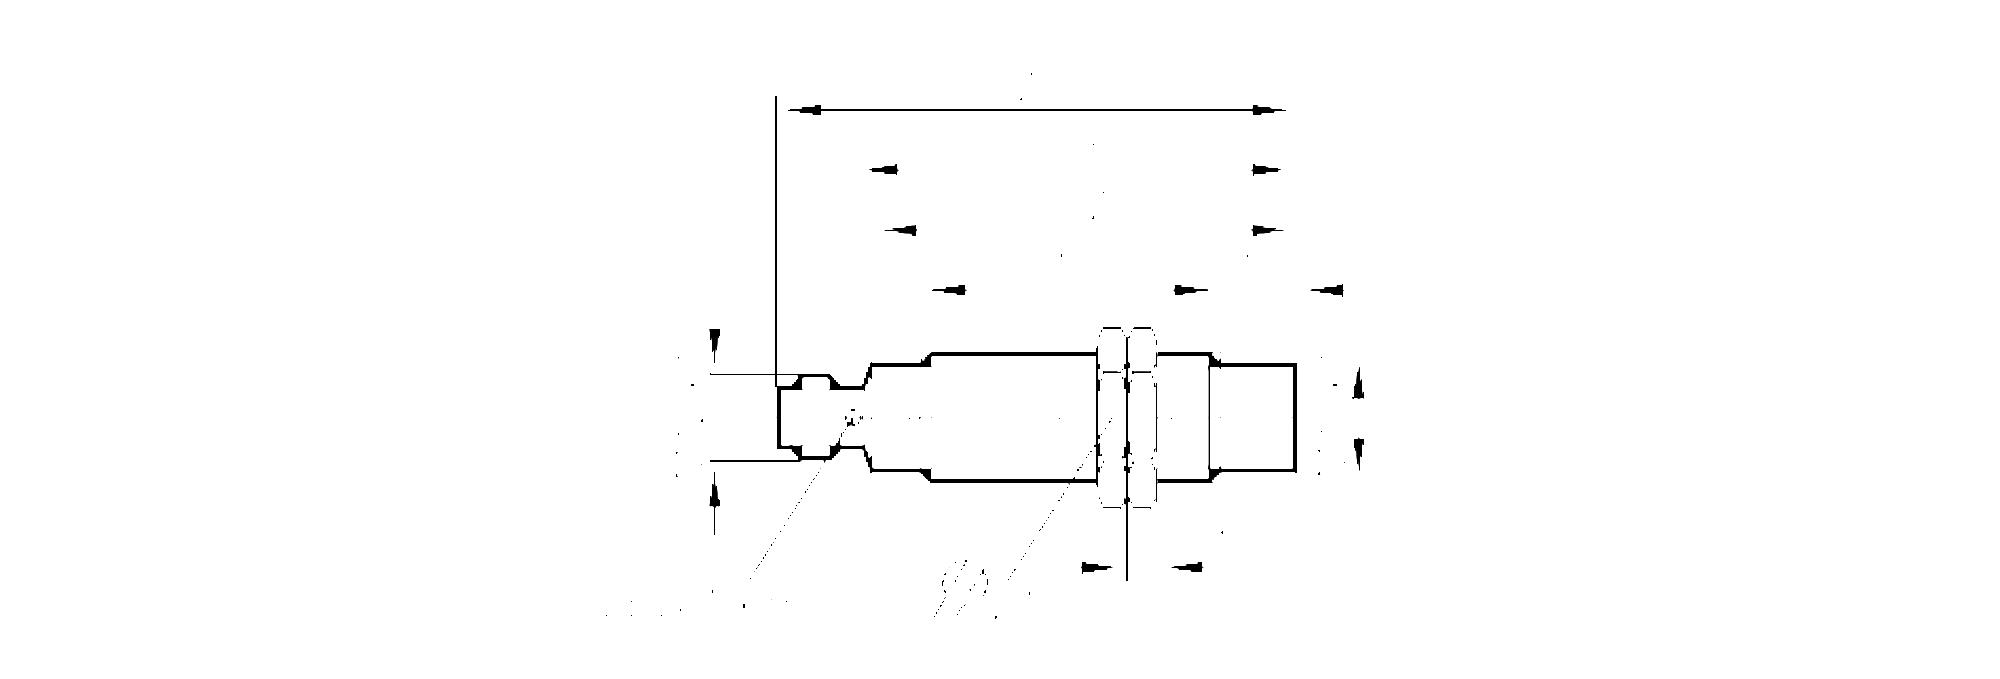 igm205 - inductive sensor